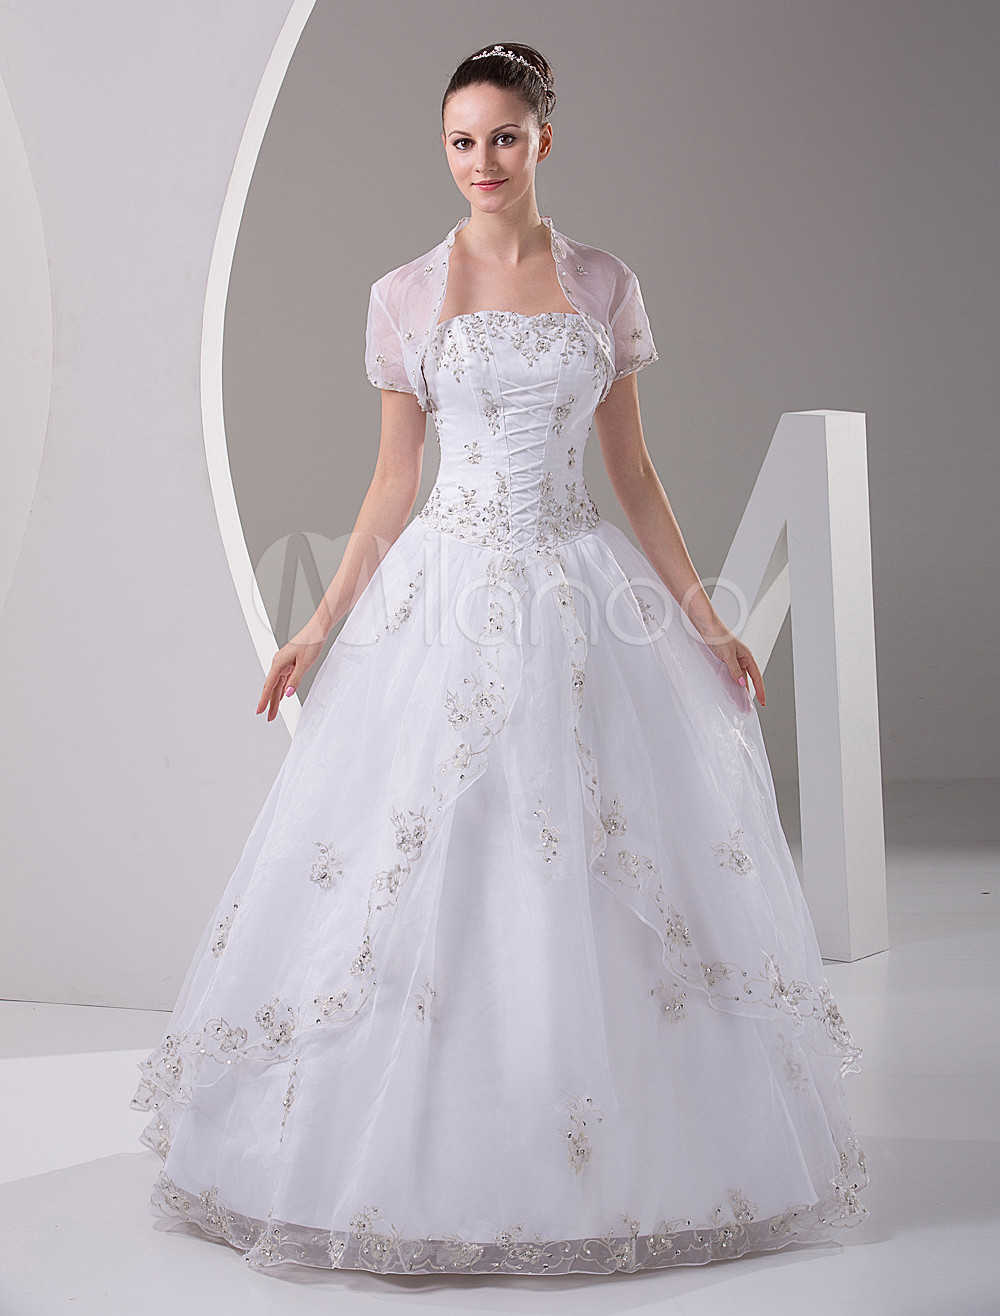 White Quinceanera Dress Strapless Satin Organza Dress (Wedding Quinceanera Dresses) photo